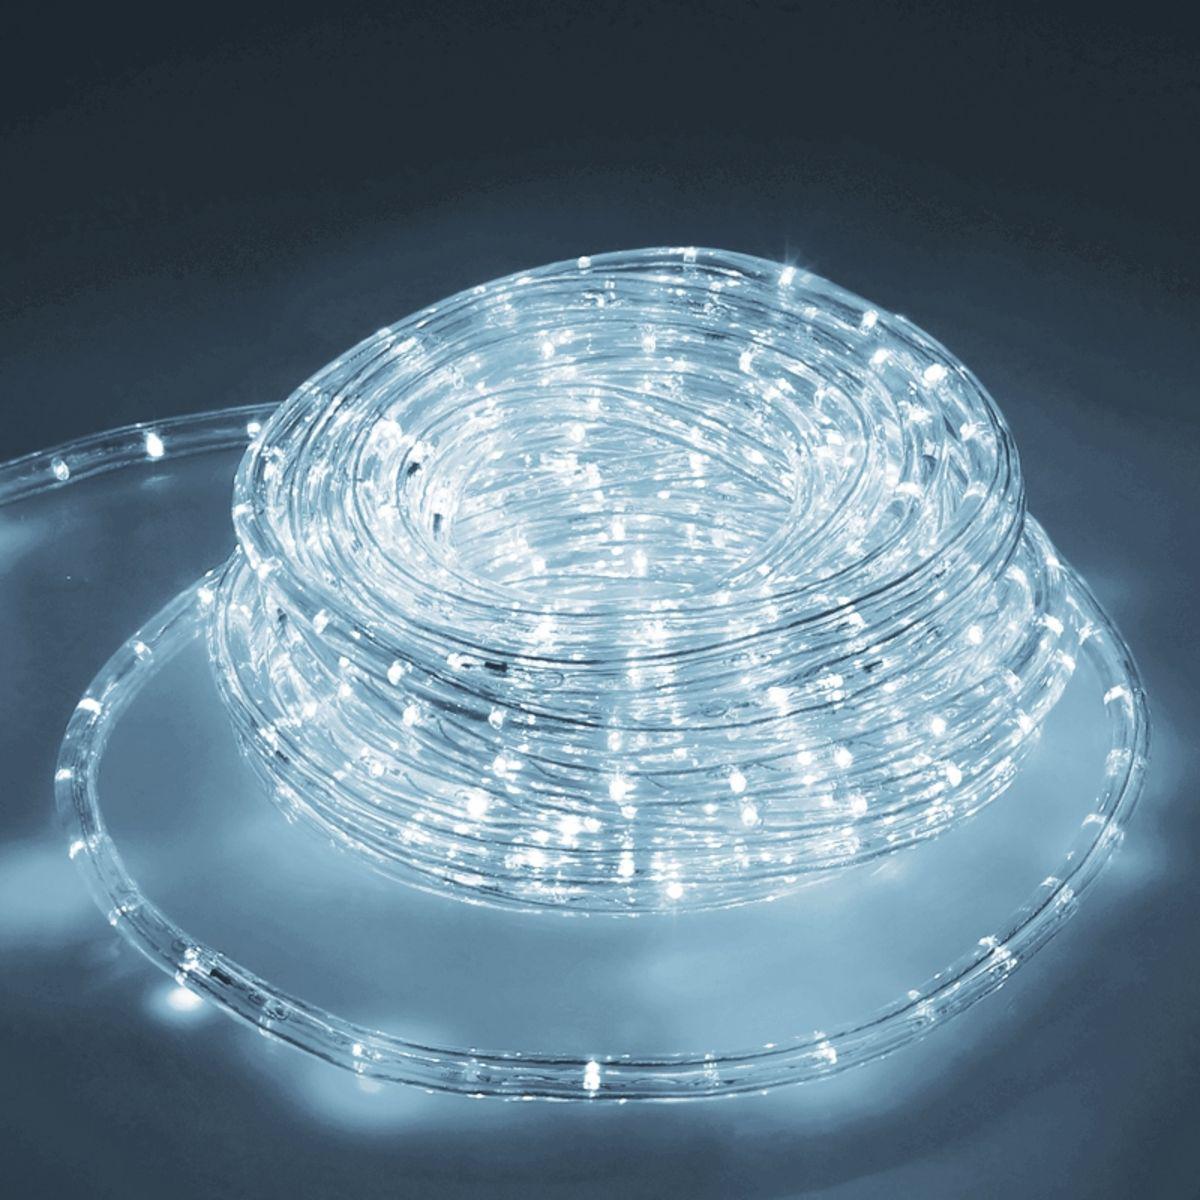 Ecd Germany ECD Germany LED Tube Lumière Guirlande 20m - 12W CA - 220-240V - Blanc froid 6000K - 791 Lumens - Bandes de LED de Noël